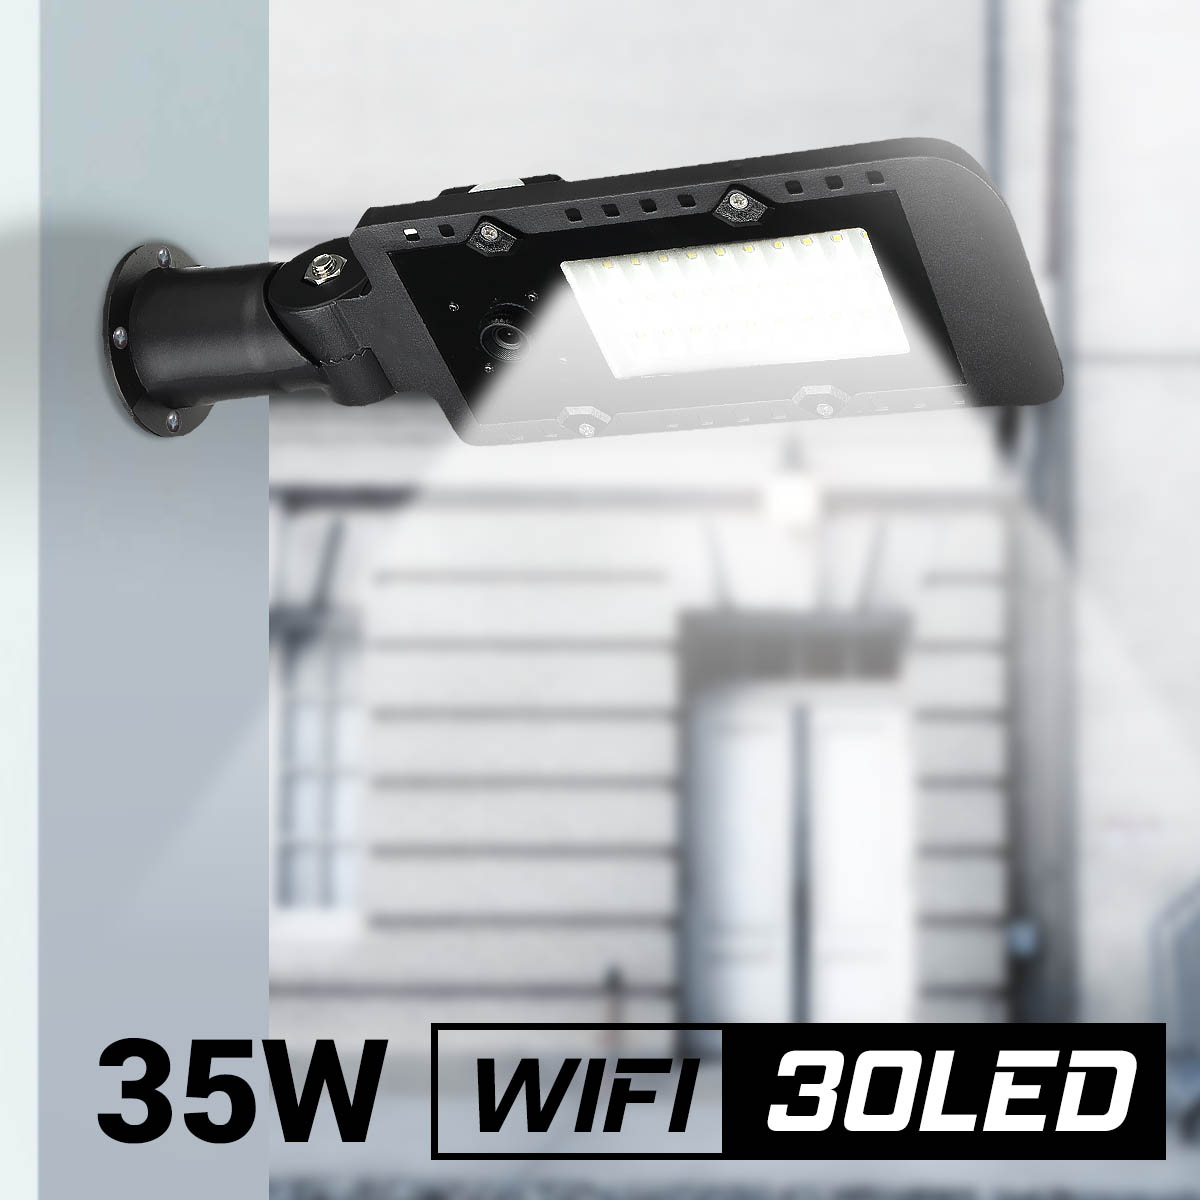 DC12V 35W Outdoor Lighting Waterproof IP65 LED Street Light with WiFi 1080P IP Camera Aluminium Alloy Garden Wall Lamp